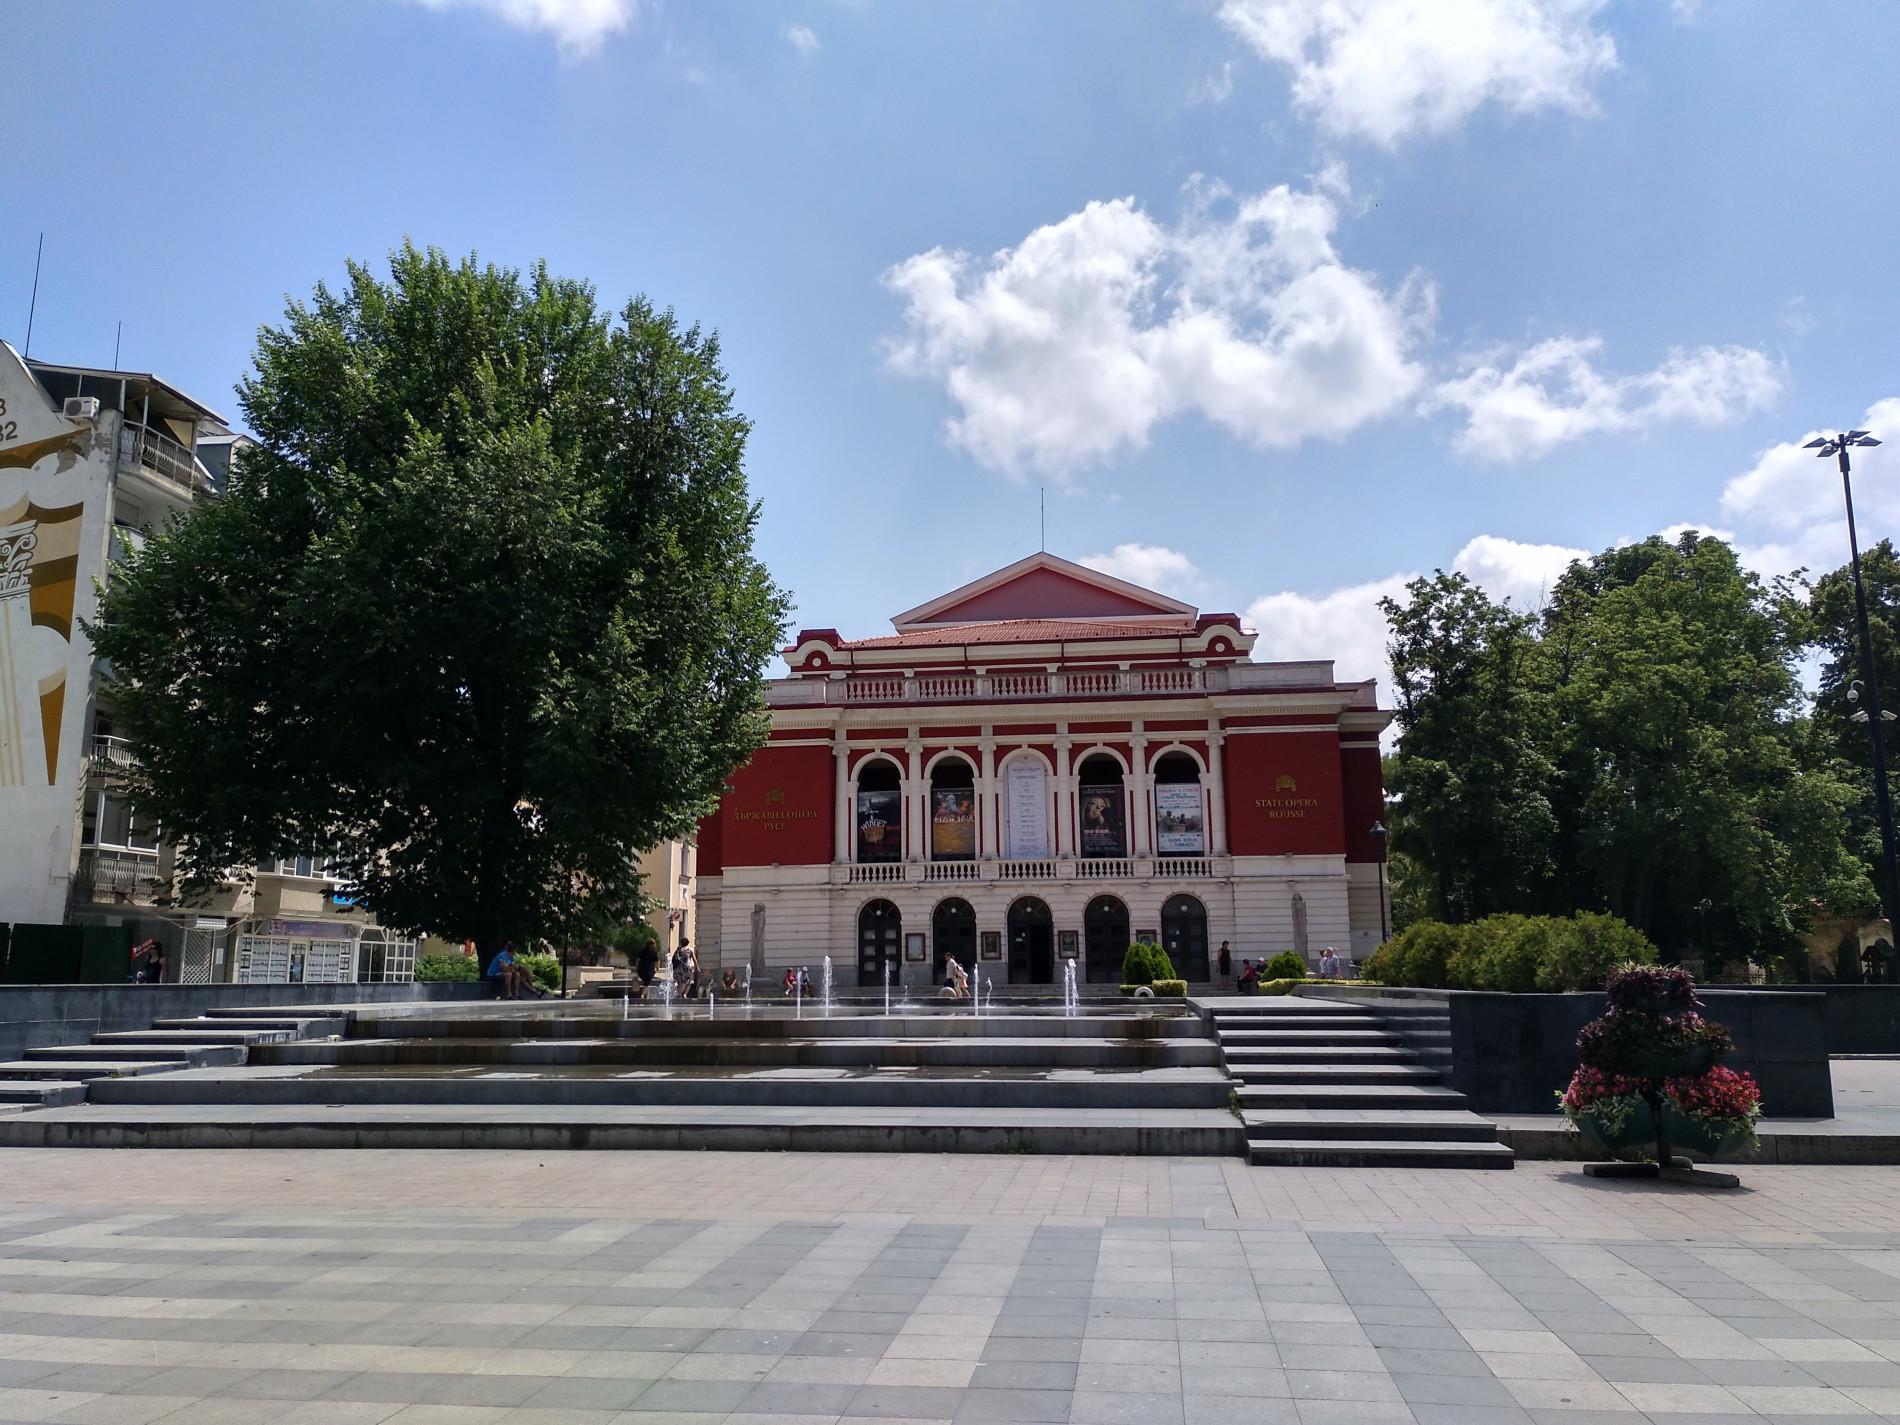 Russe Opernhaus